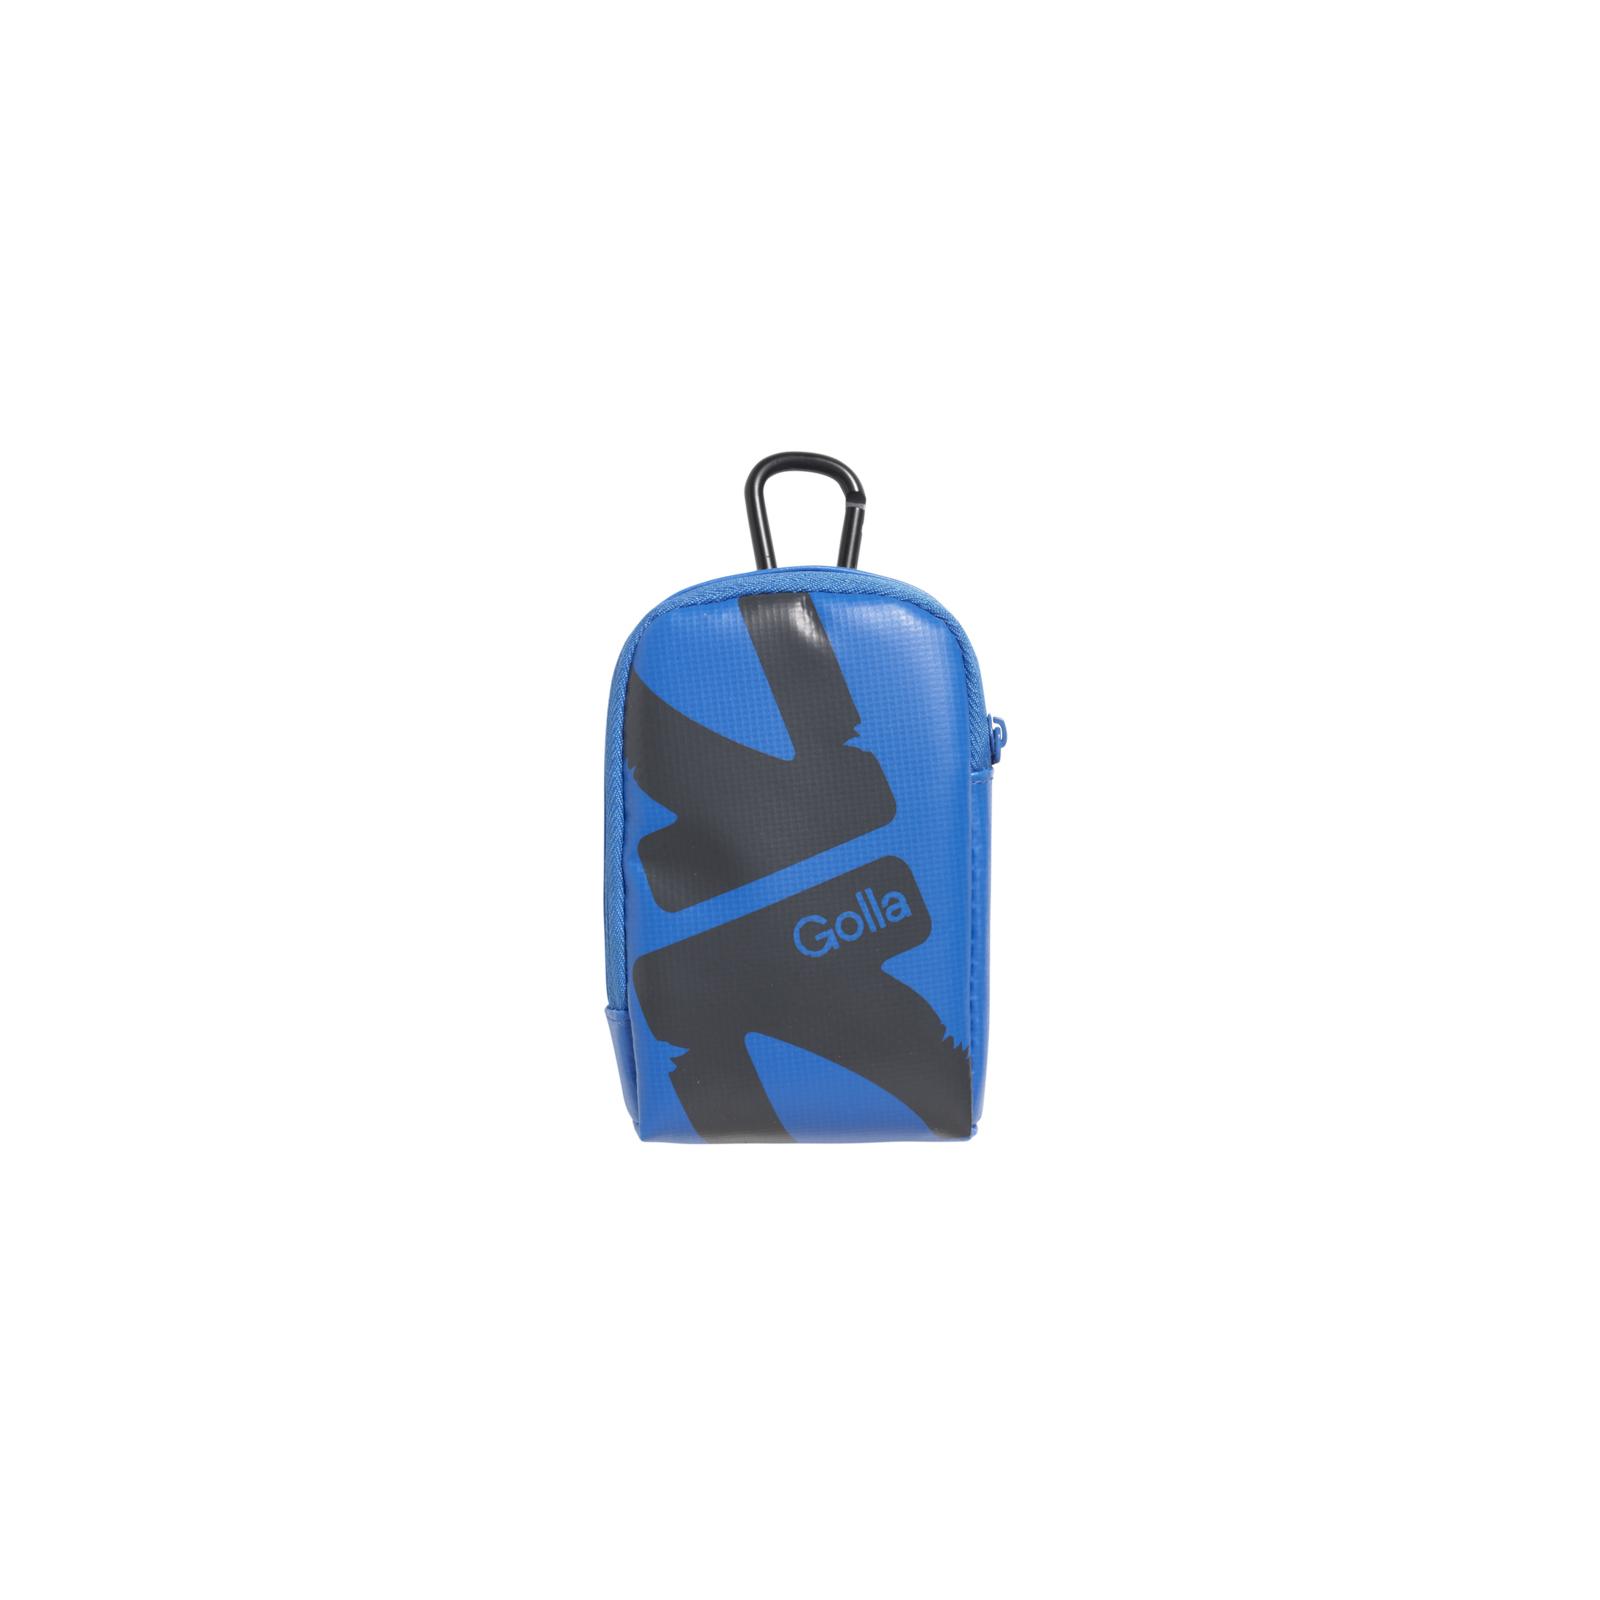 Фото-сумка Golla Digi Bag Burt PVC/polyester /blue (G1353)